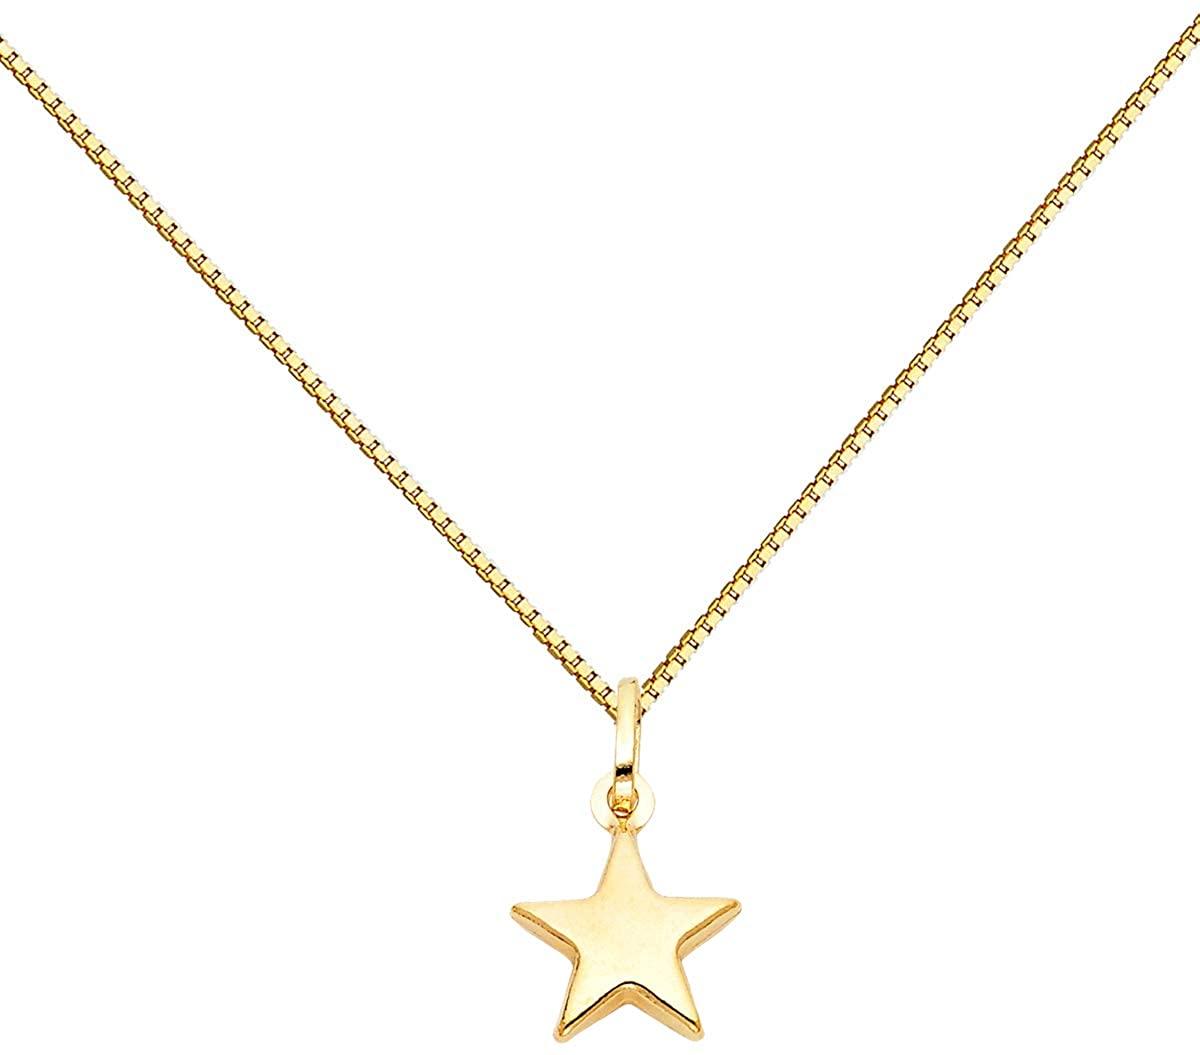 TGDJ 14k Yellow Gold Star Pendant 0.65mm Box Link Chain Necklace